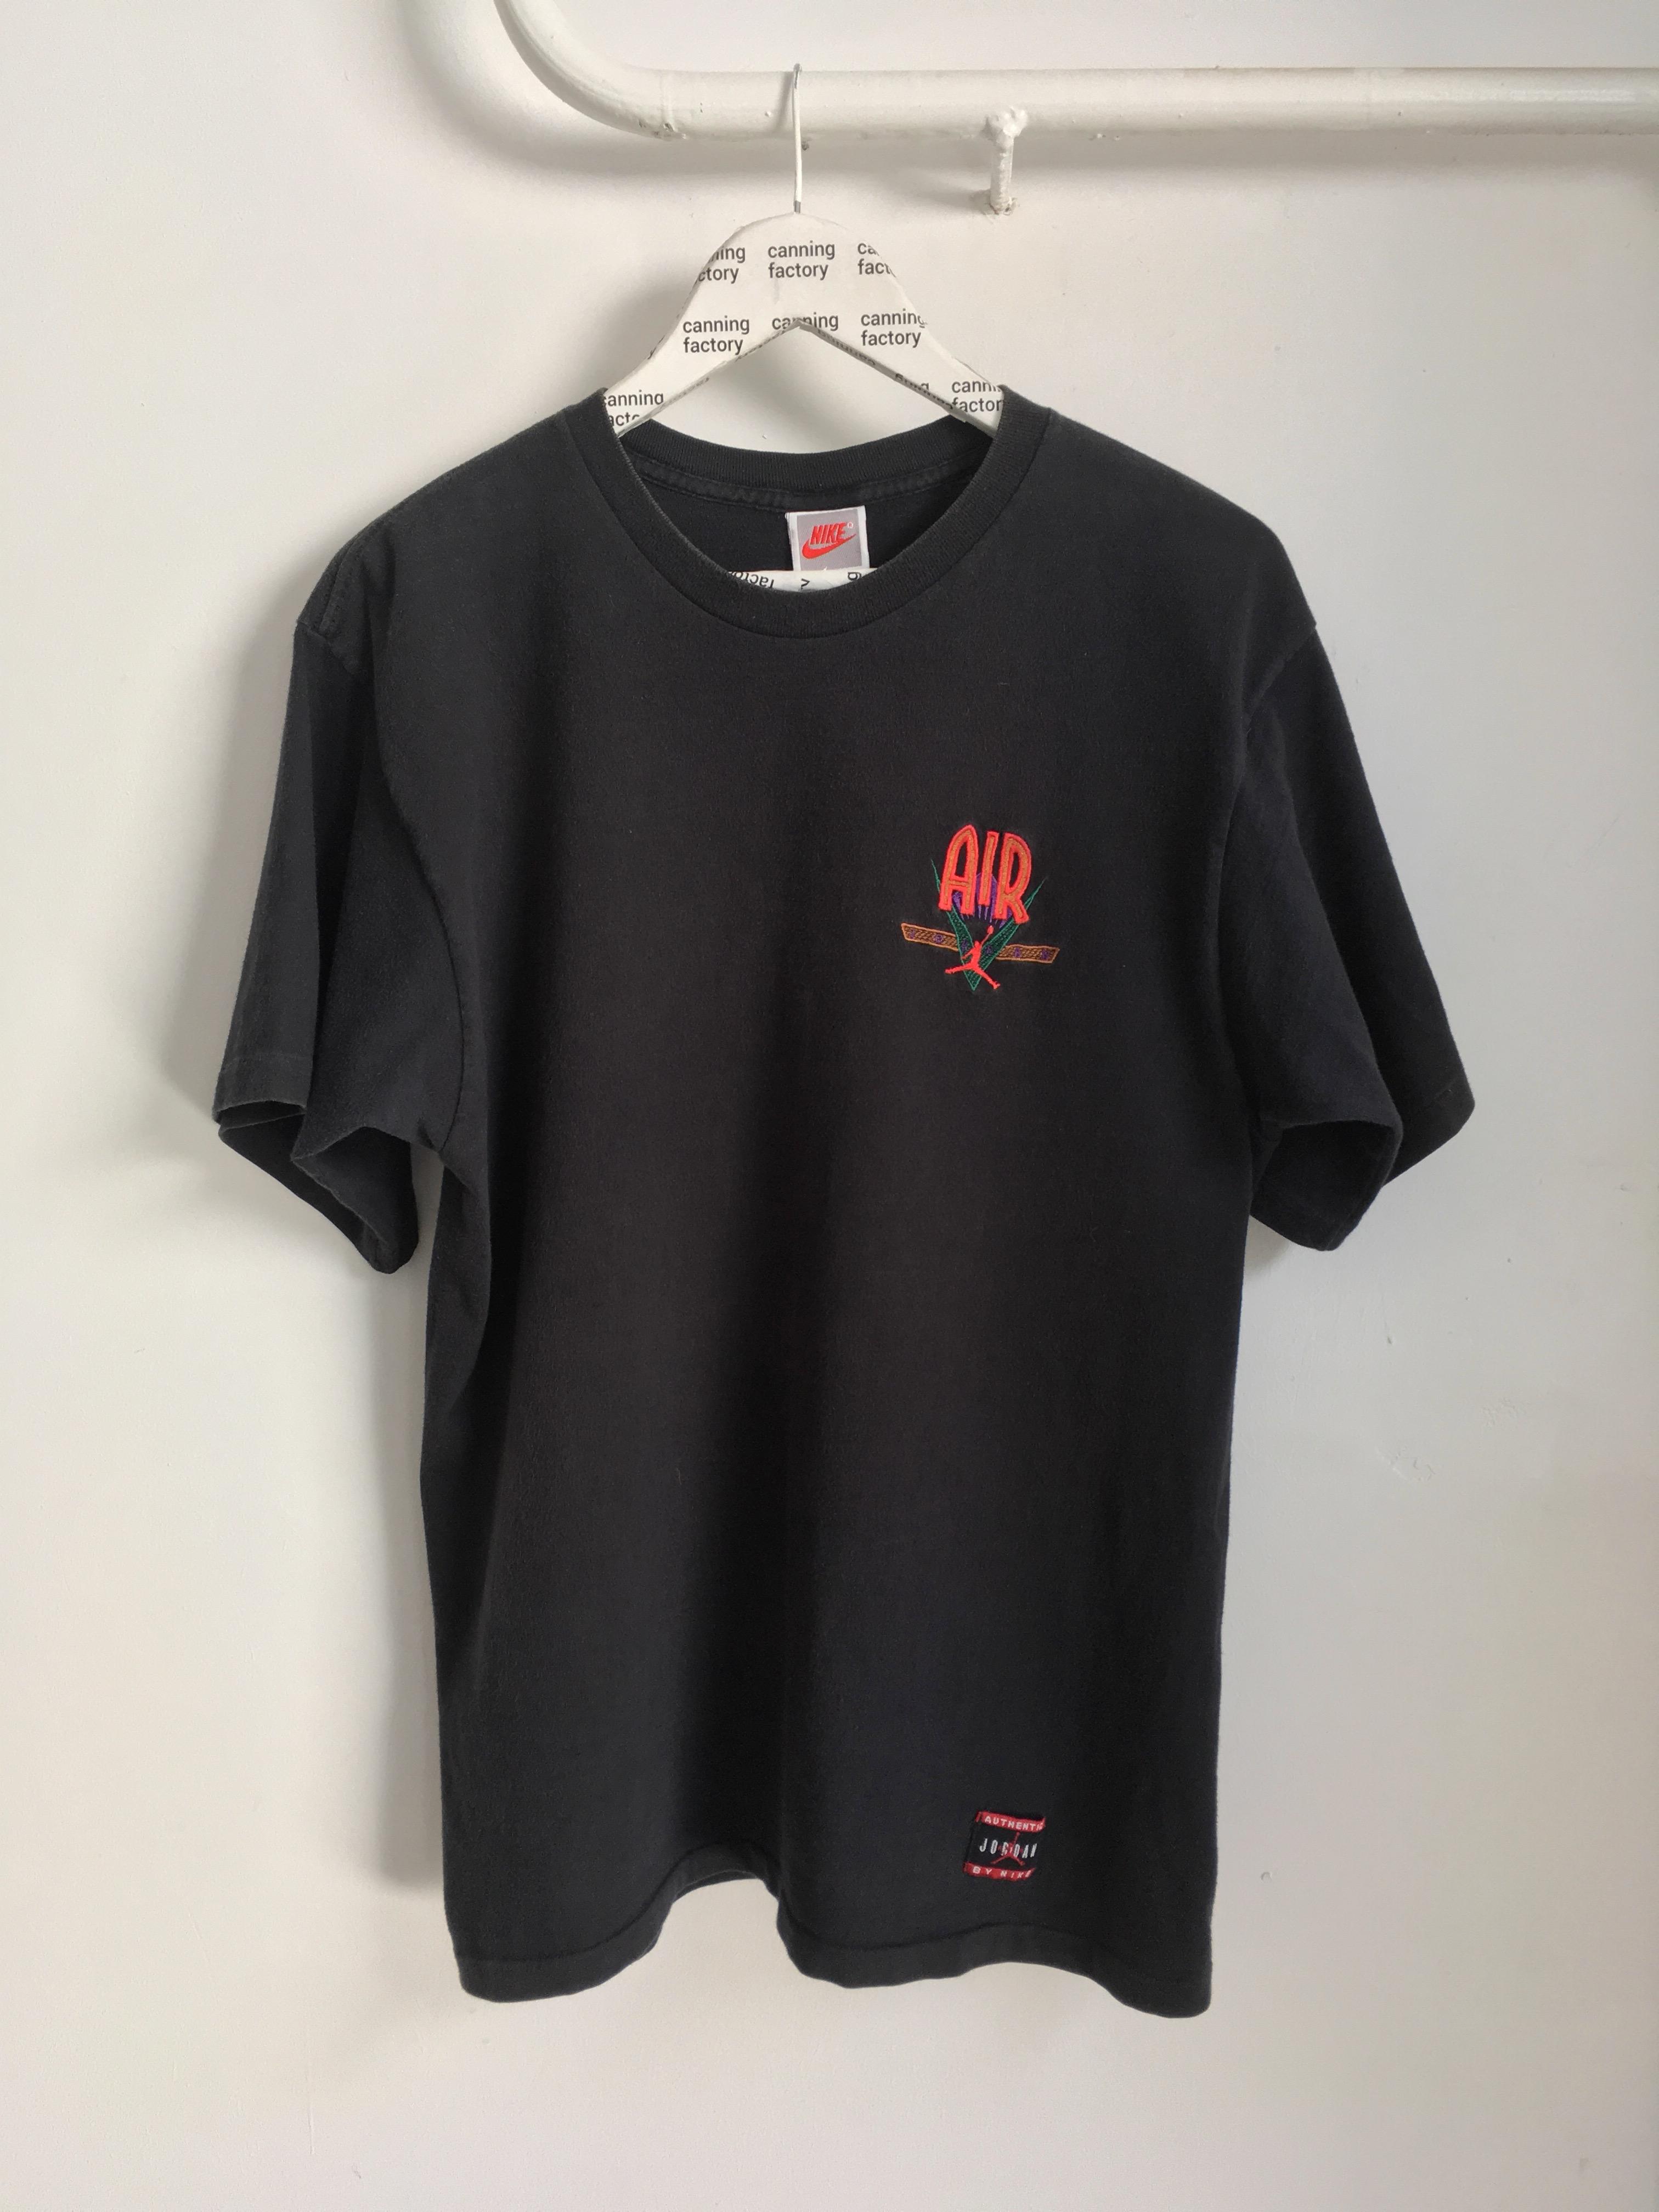 d4100cbe08ed Nike  last Drop  Vintage Nike Air Jordan T-shirt Made In Usa